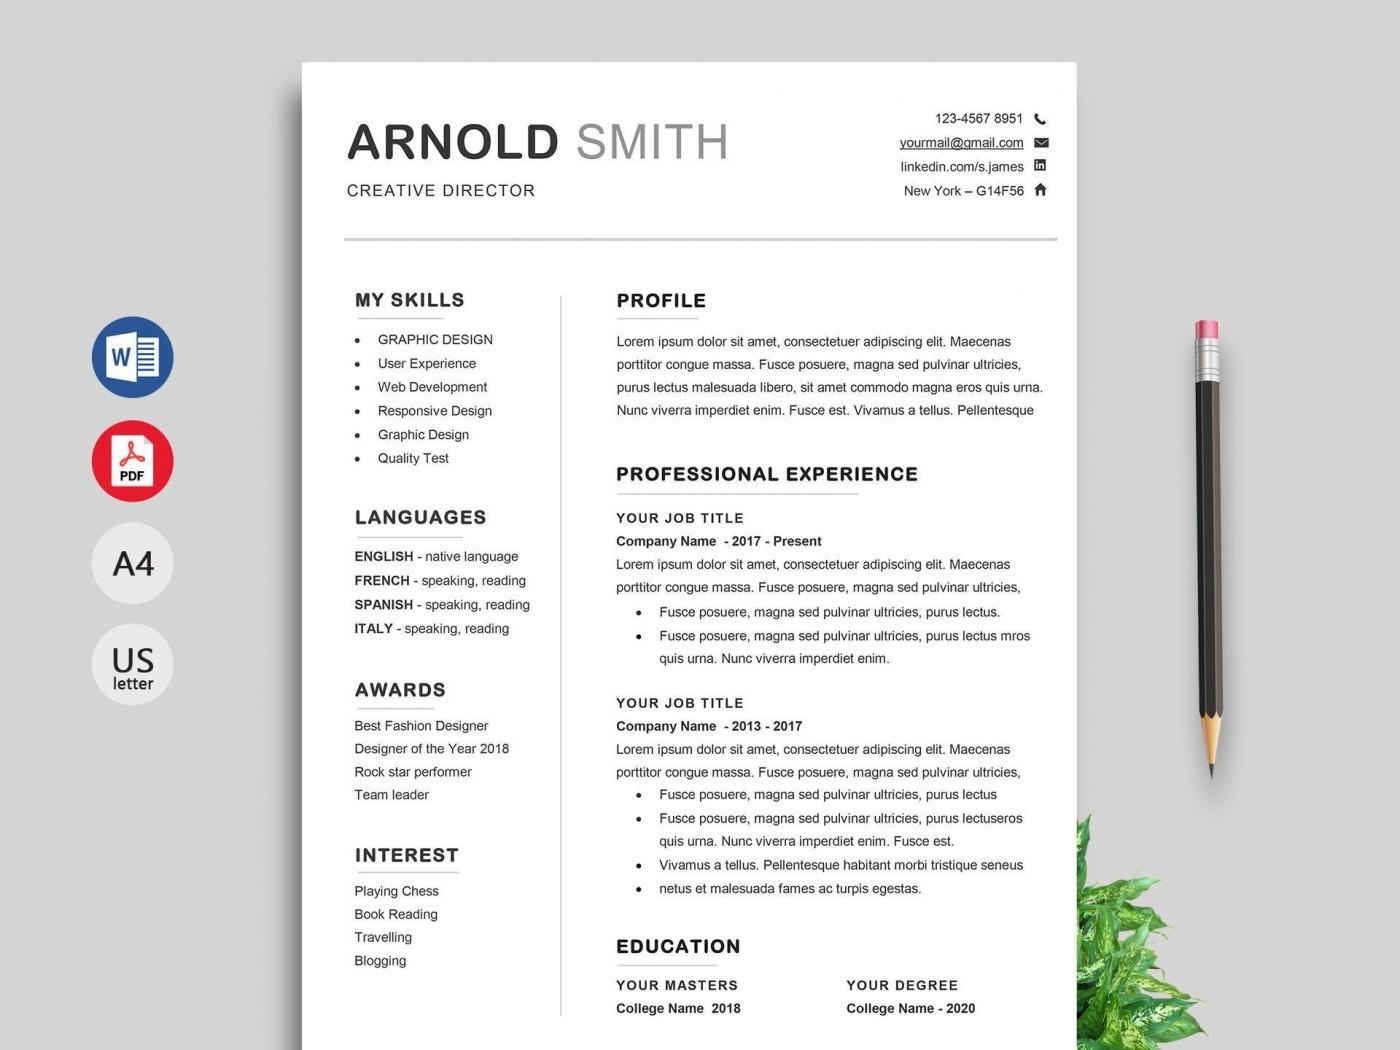 000 Impressive Professional Resume Template 2018 Free Download Idea 1400